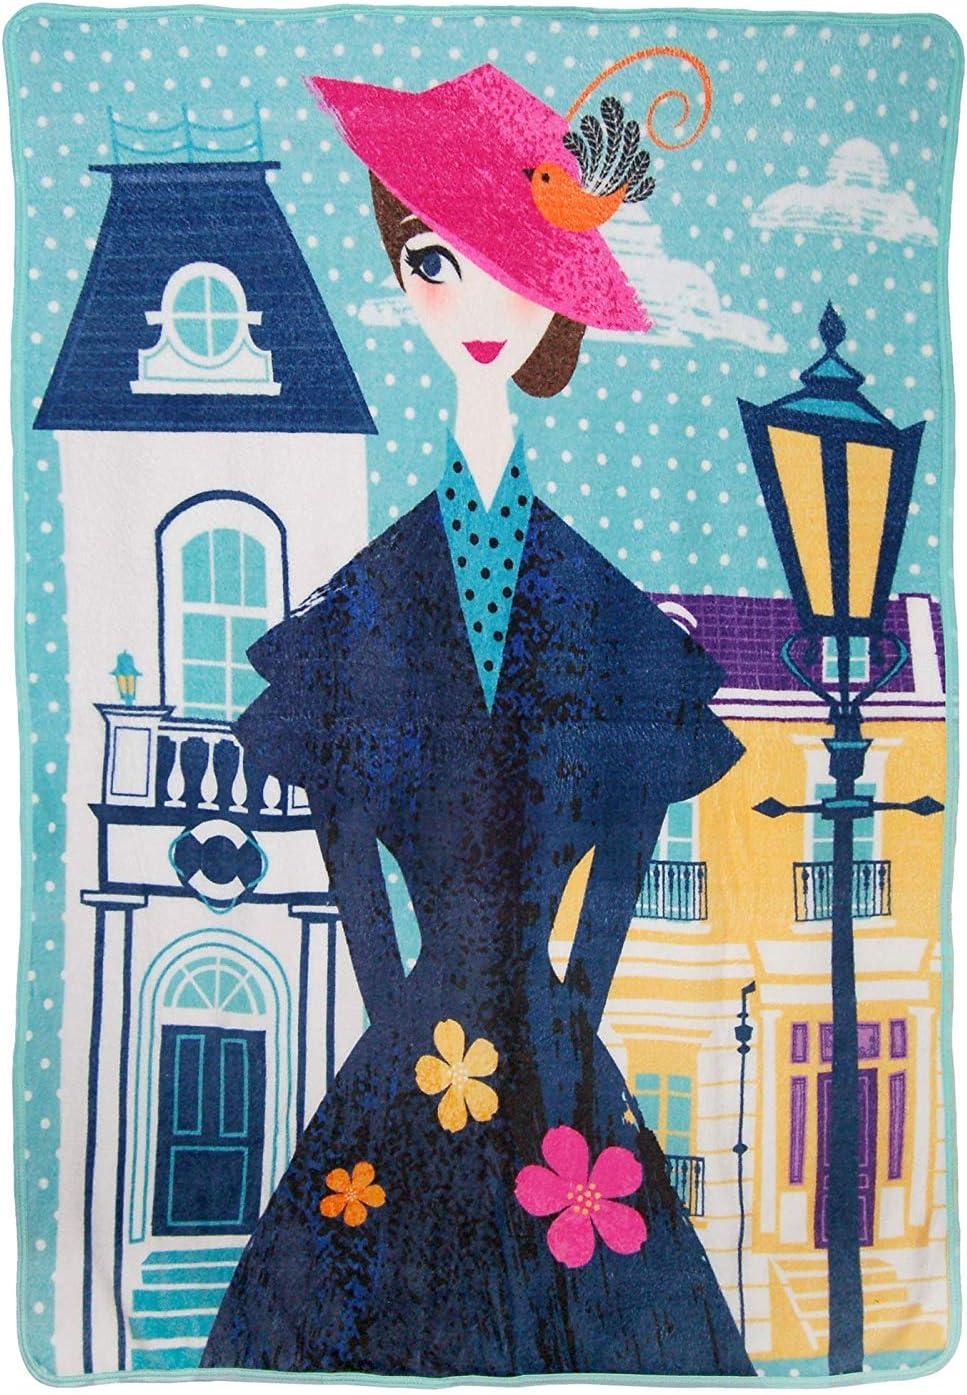 "Kids Warehouse Disney Mary Poppins Chim Chiminy Throw Blanket - 60"" by 46"""